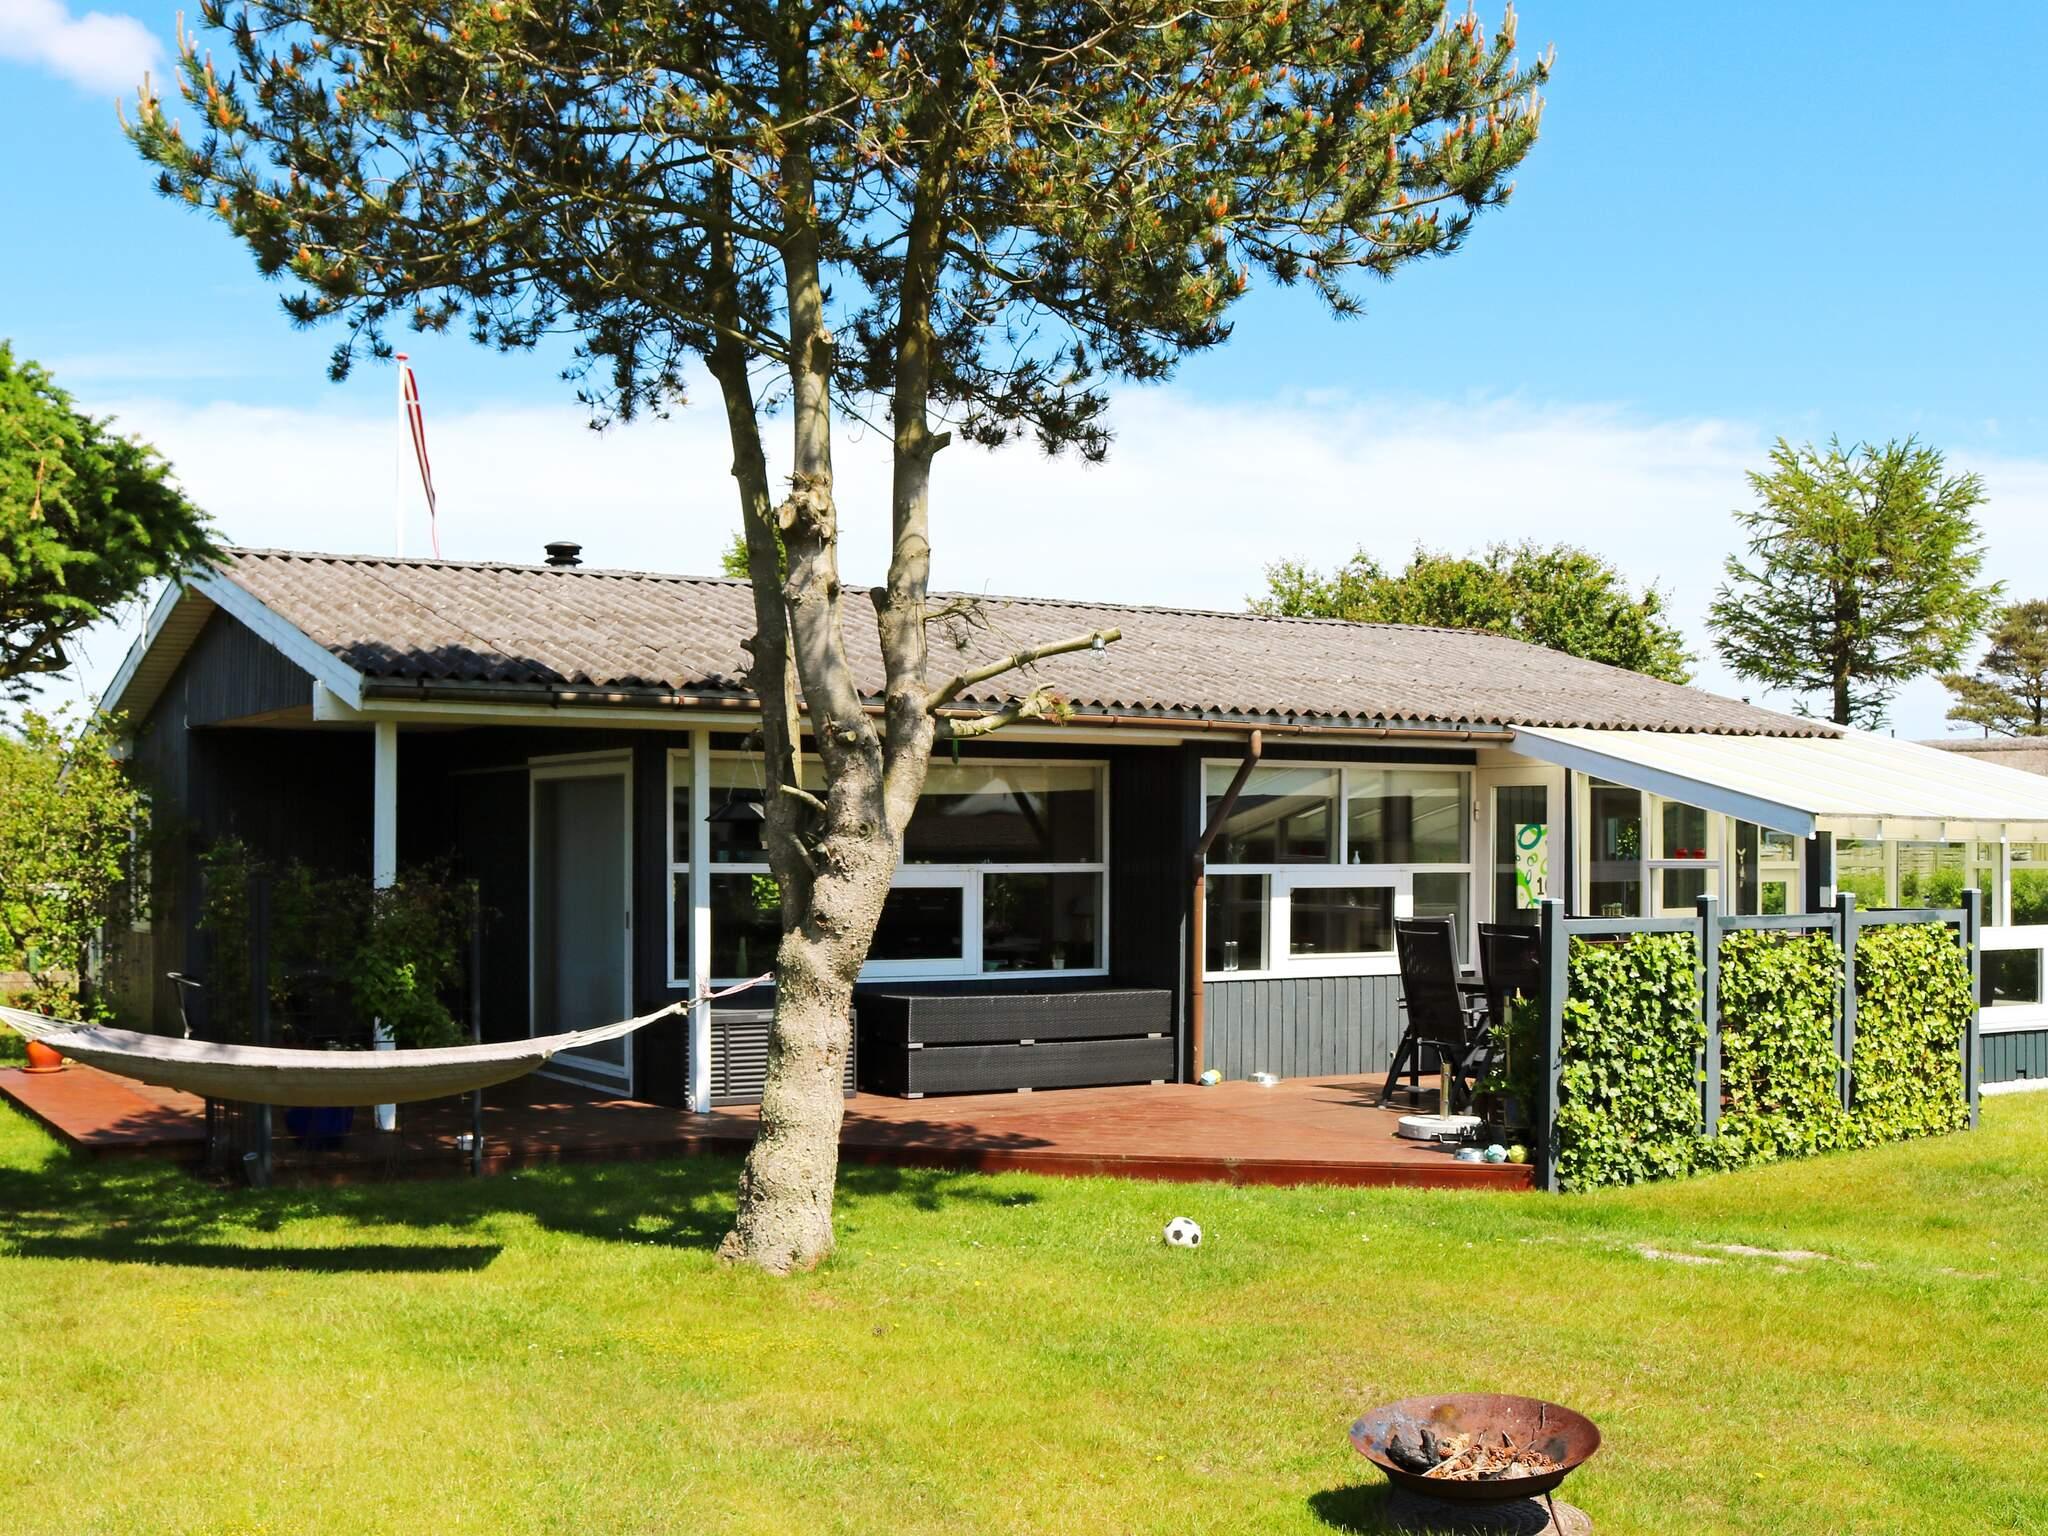 Ferienhaus Øster Hurup (356533), Øster Hurup, , Dänische Ostsee, Dänemark, Bild 12